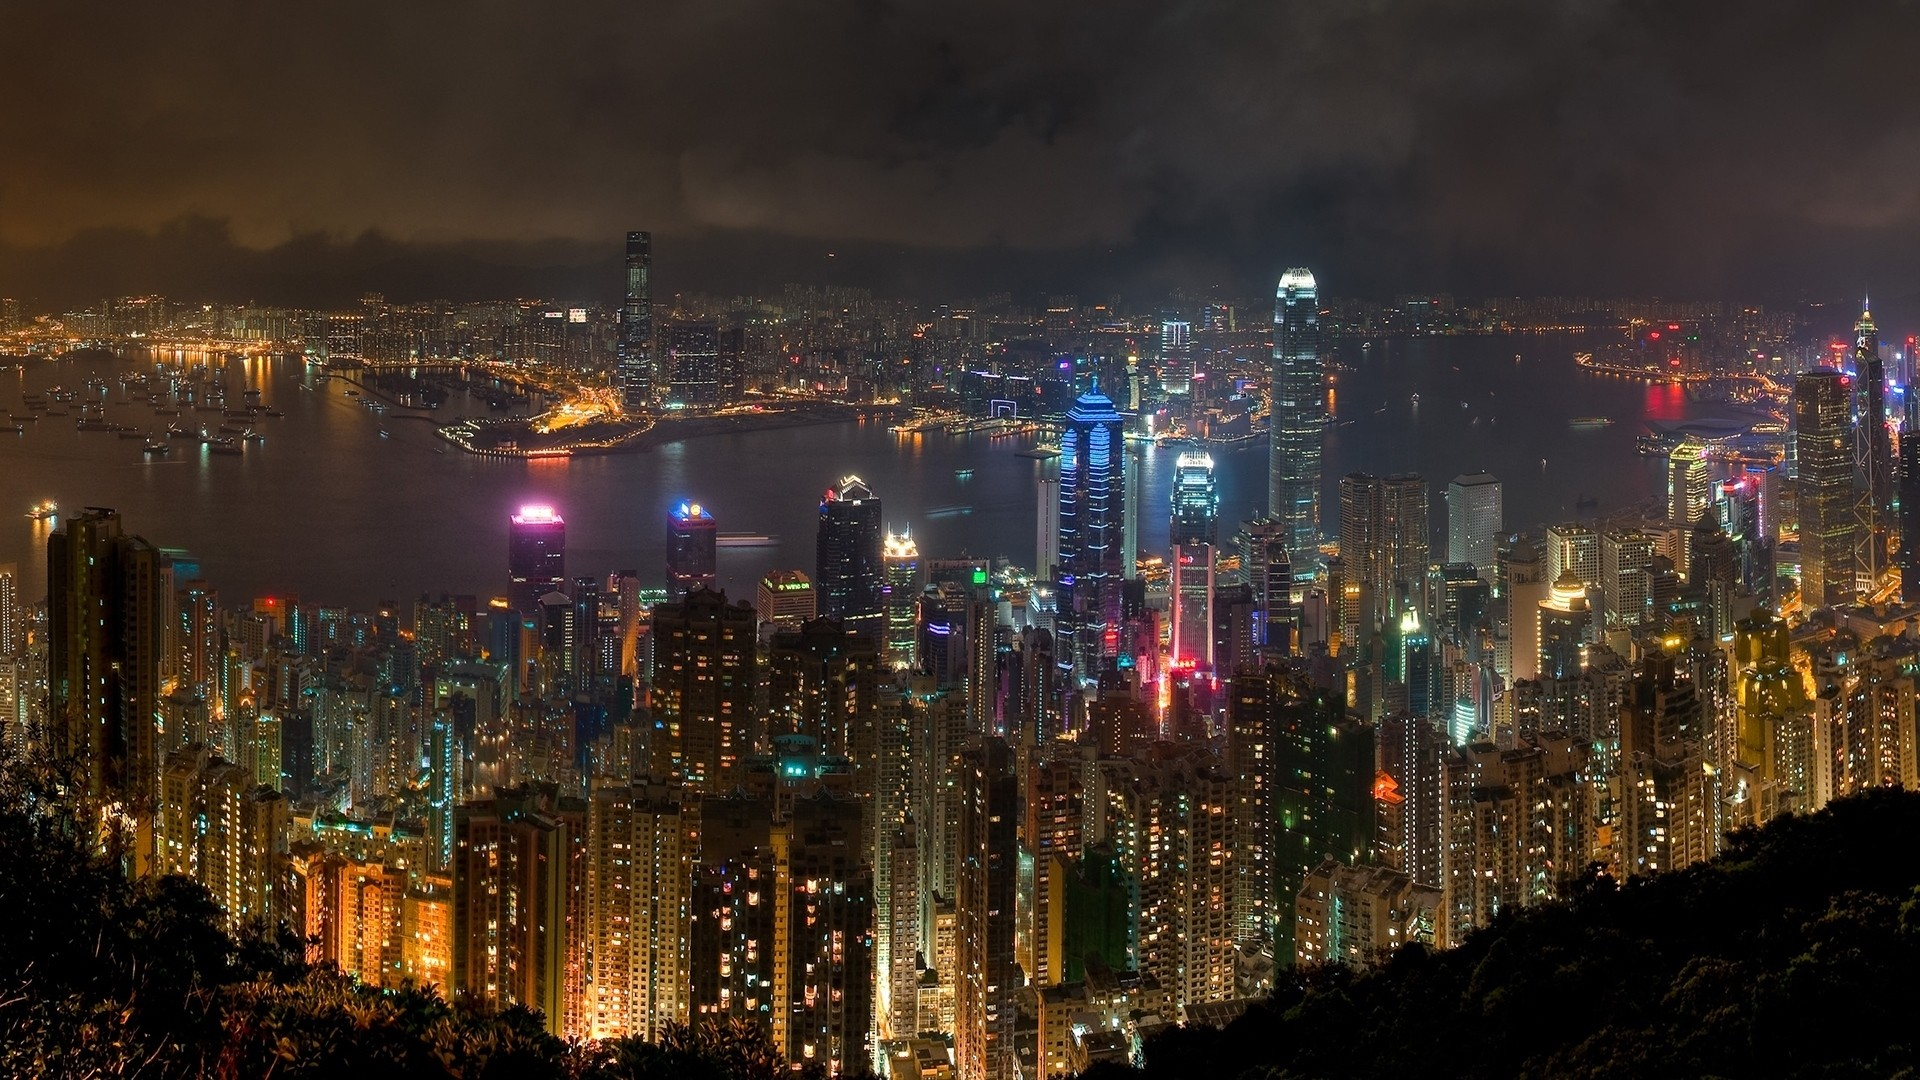 Dark City Wallpaper Pic